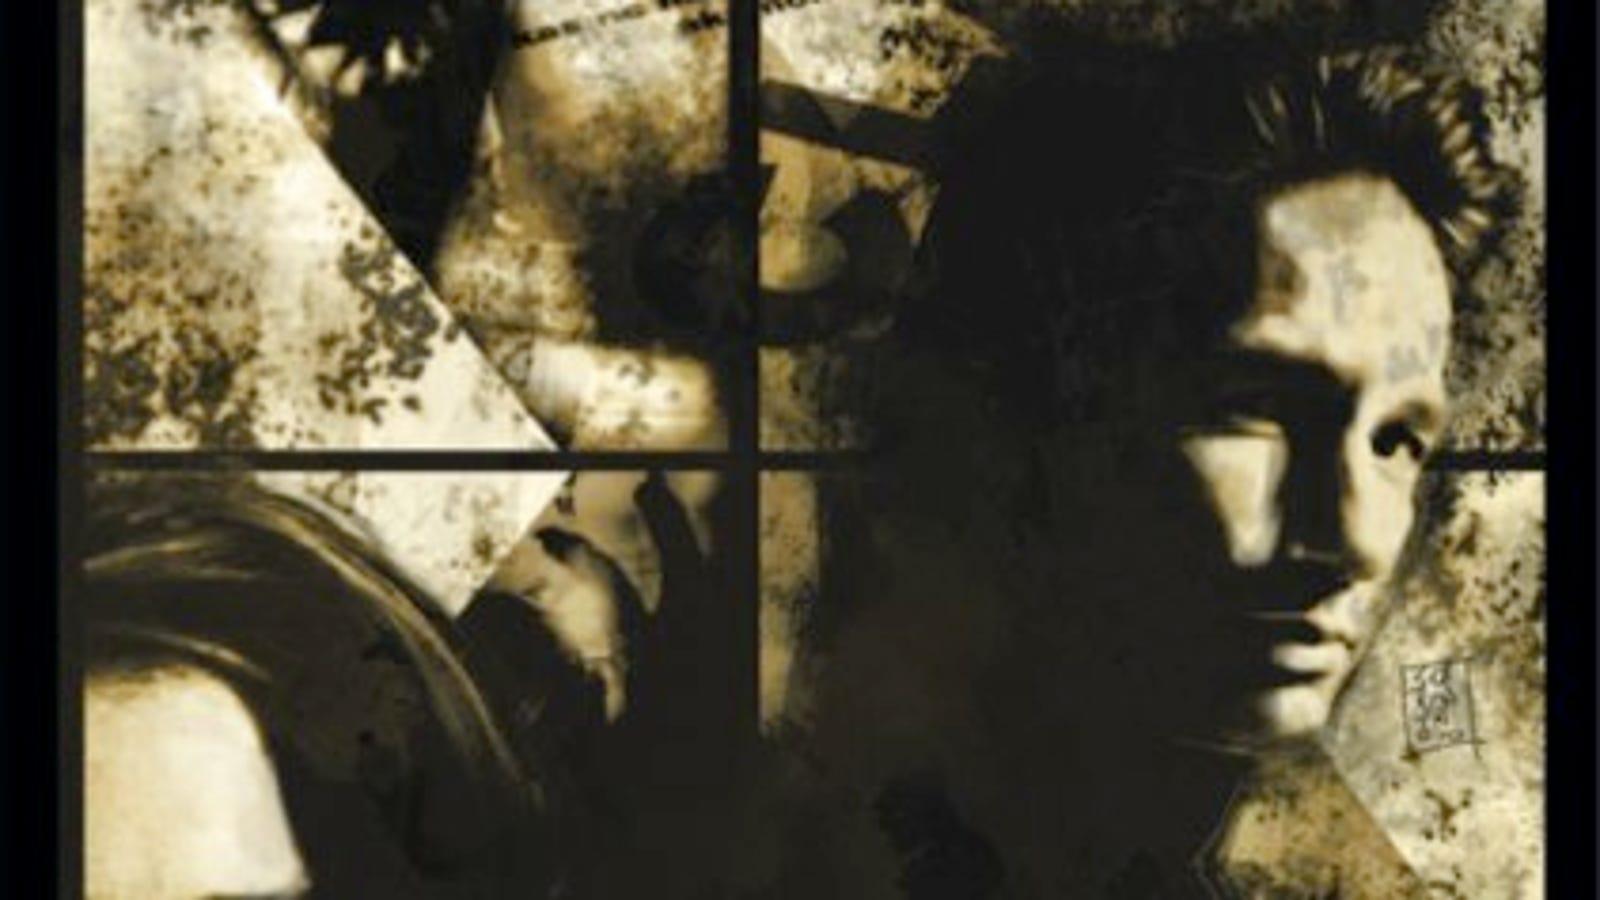 X Files 30 Days Of Night Gallery